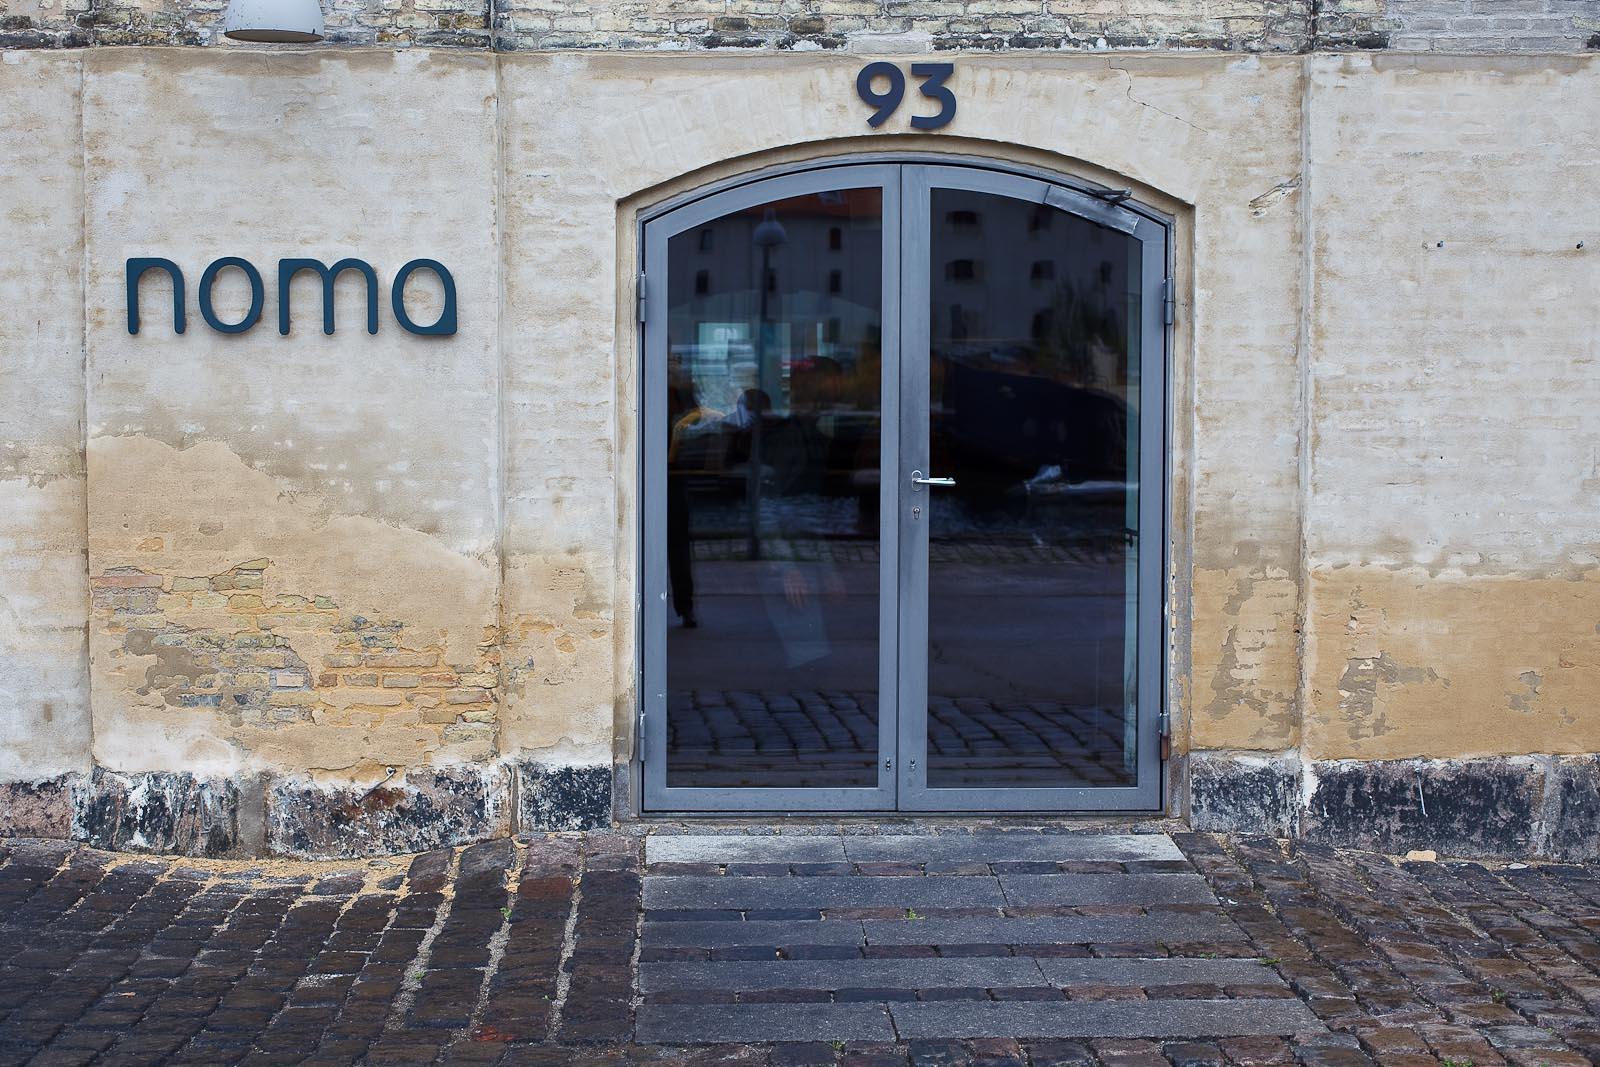 Noma to open in Sydney